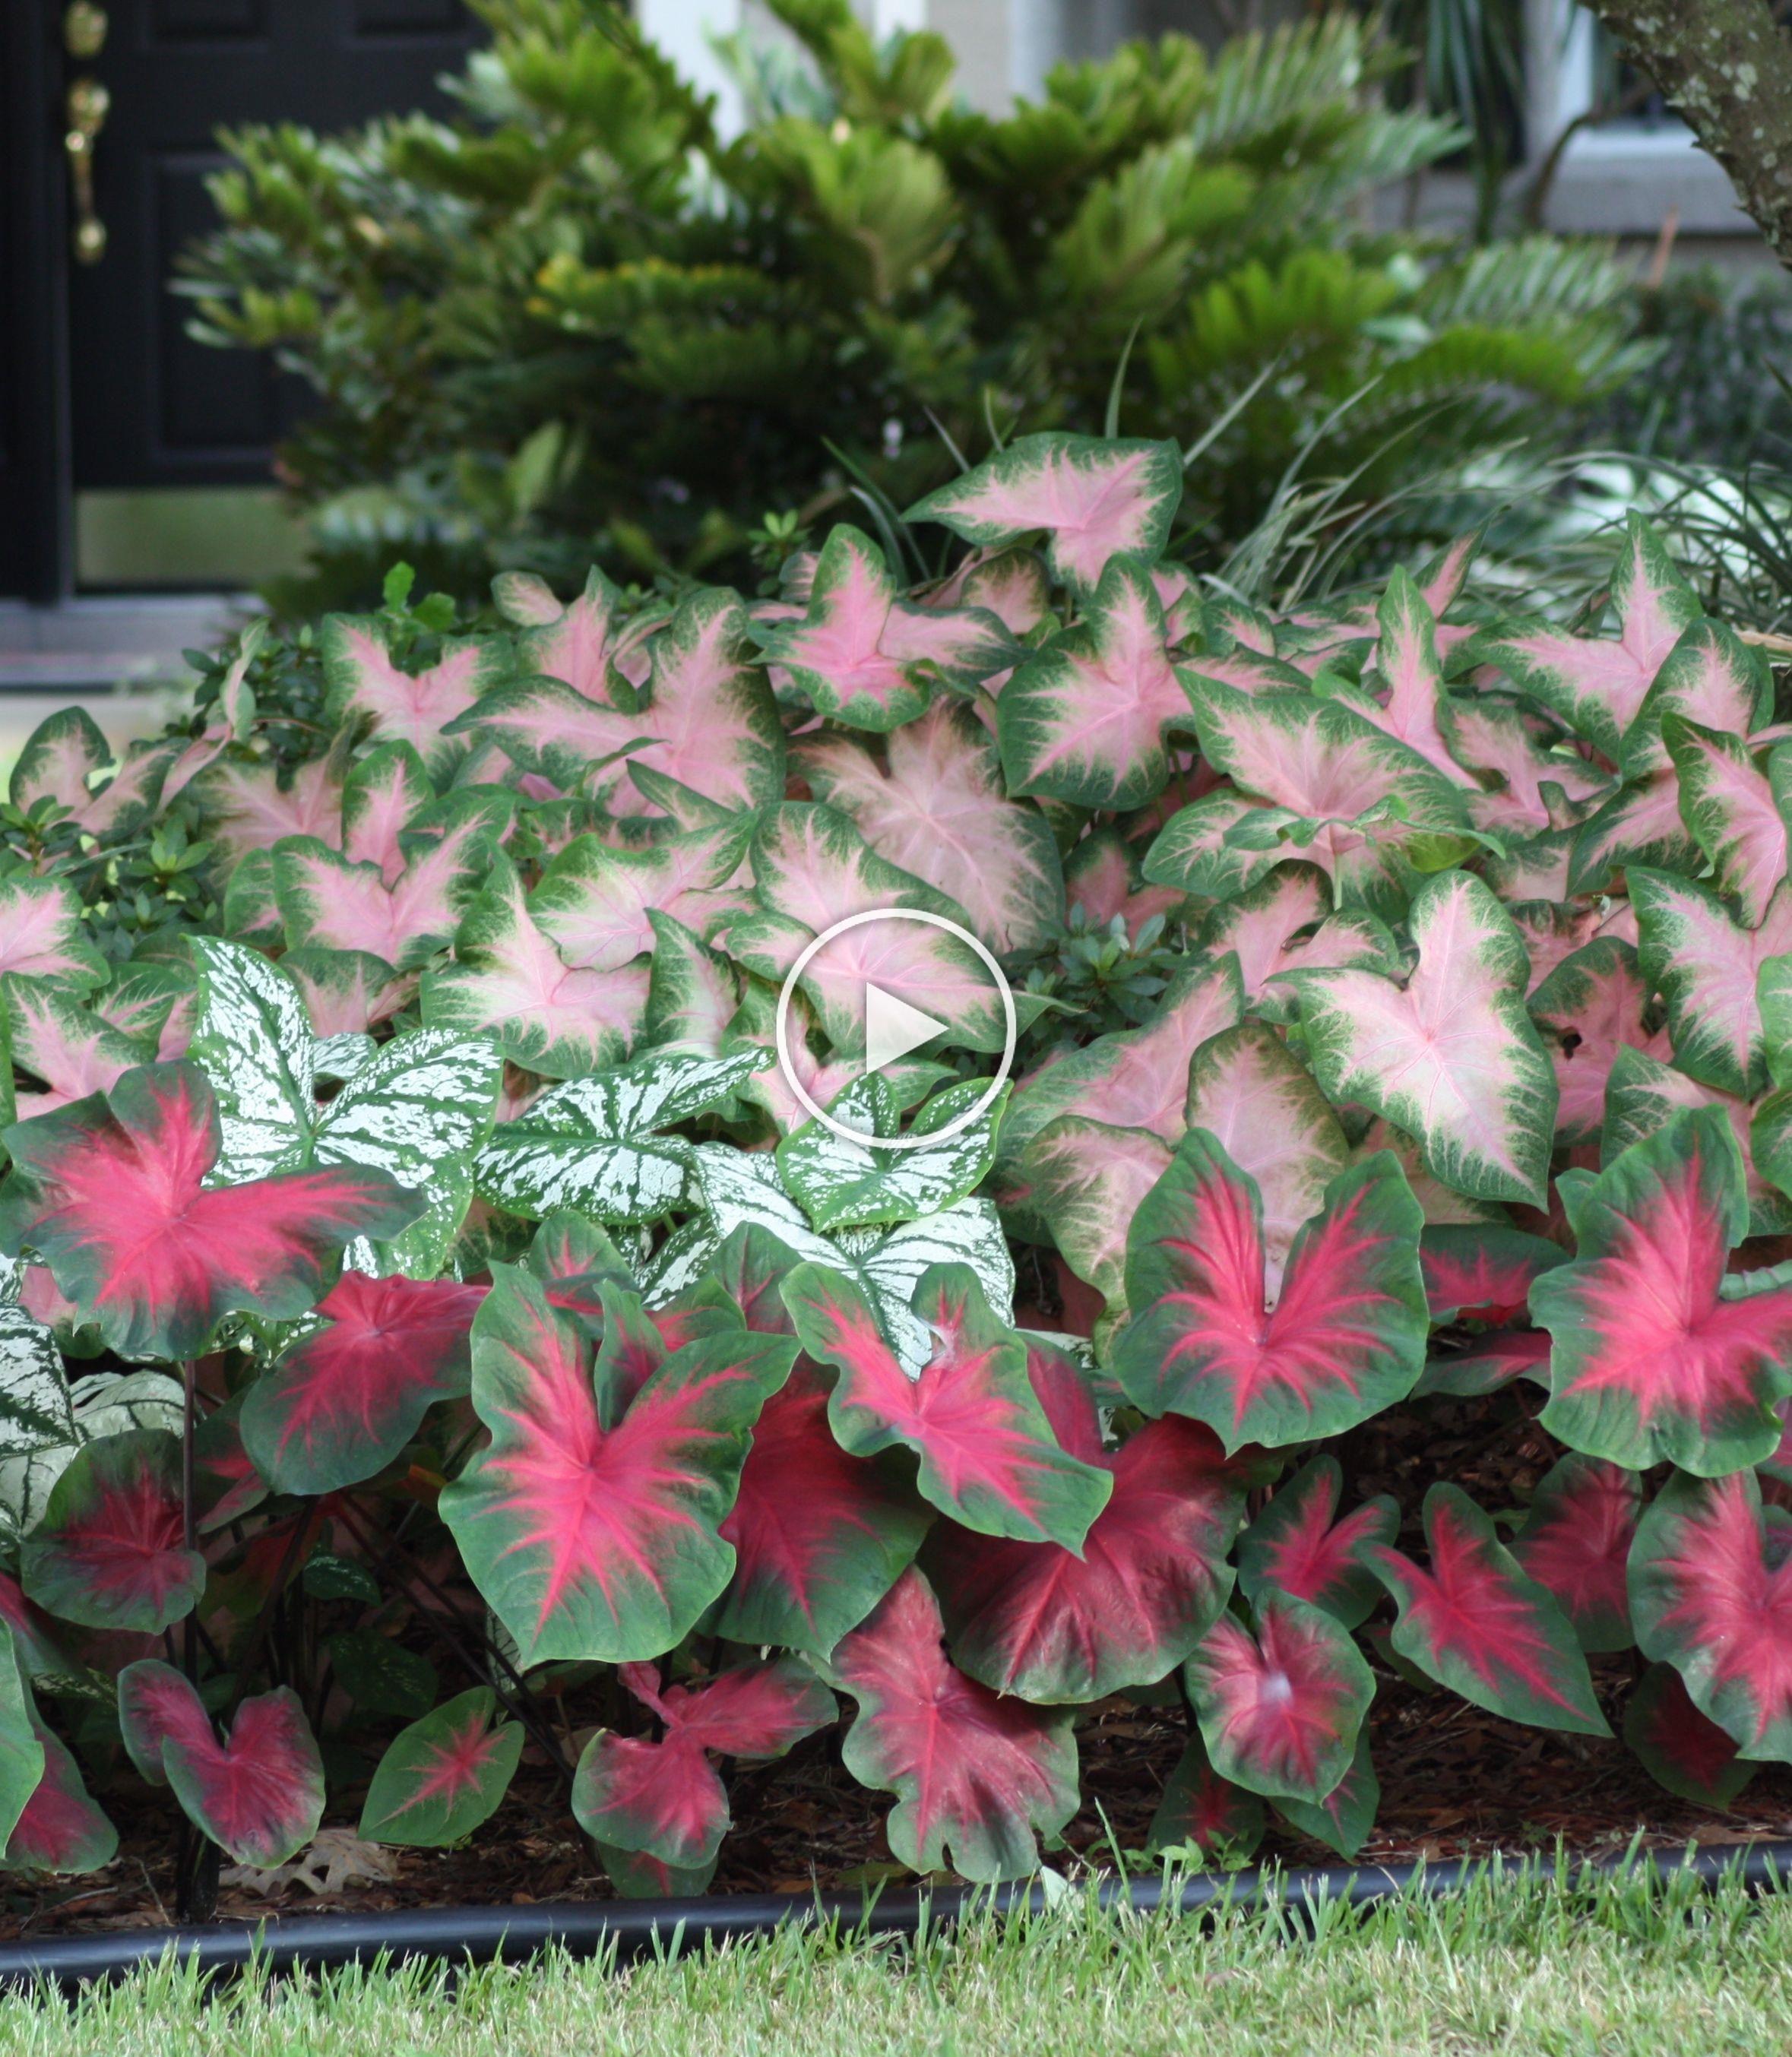 4bb2a5a4be98f96d90c398fa5bc2ac37 - What Type Plants Are Suitable For Micro Gardening